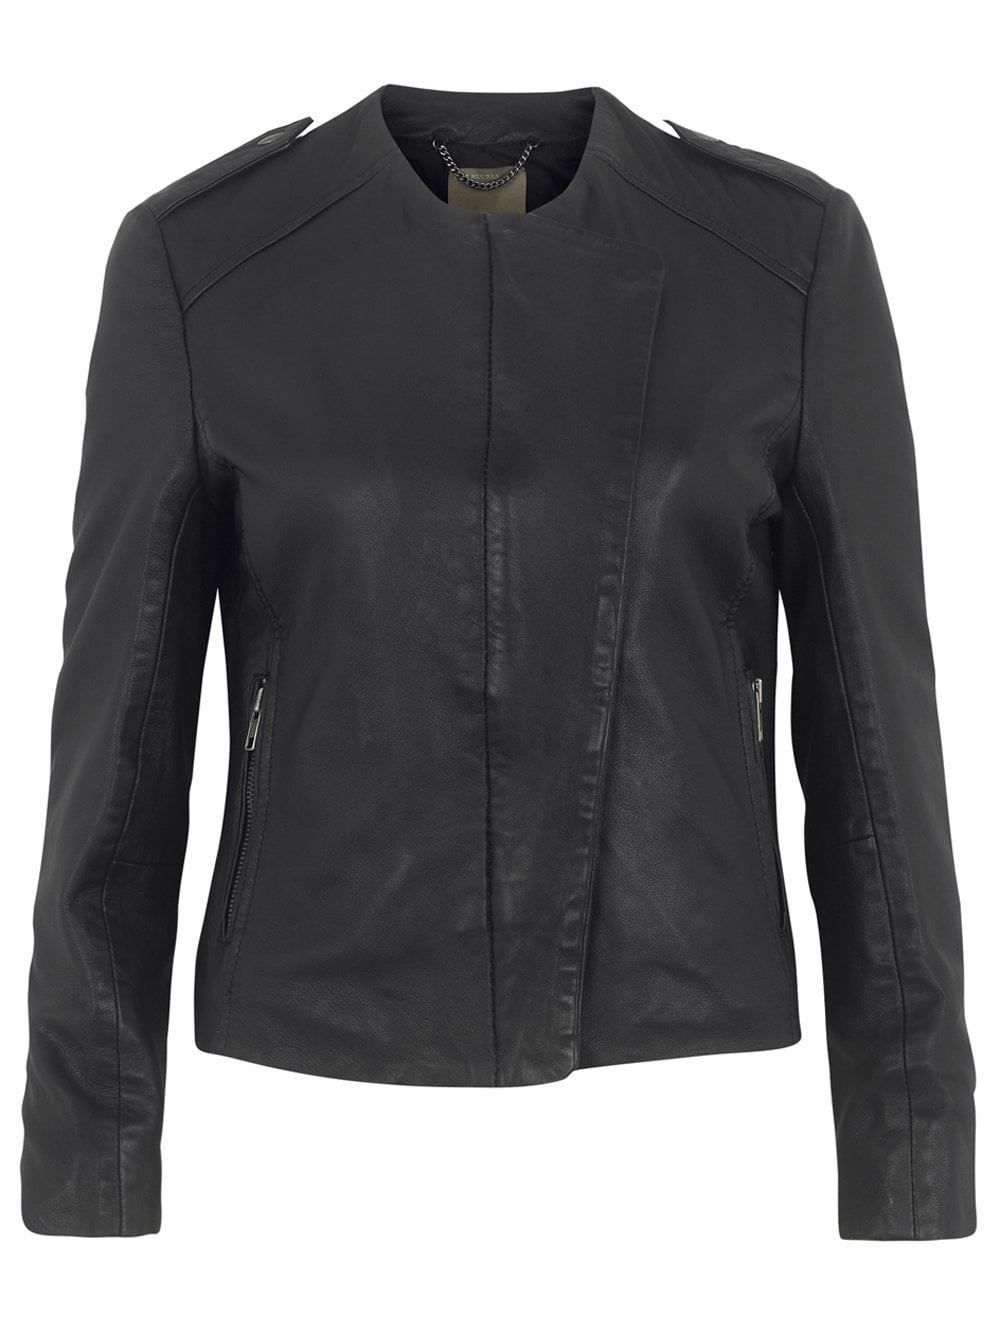 Muubaa Norma Collarless Leather Jacket in Black